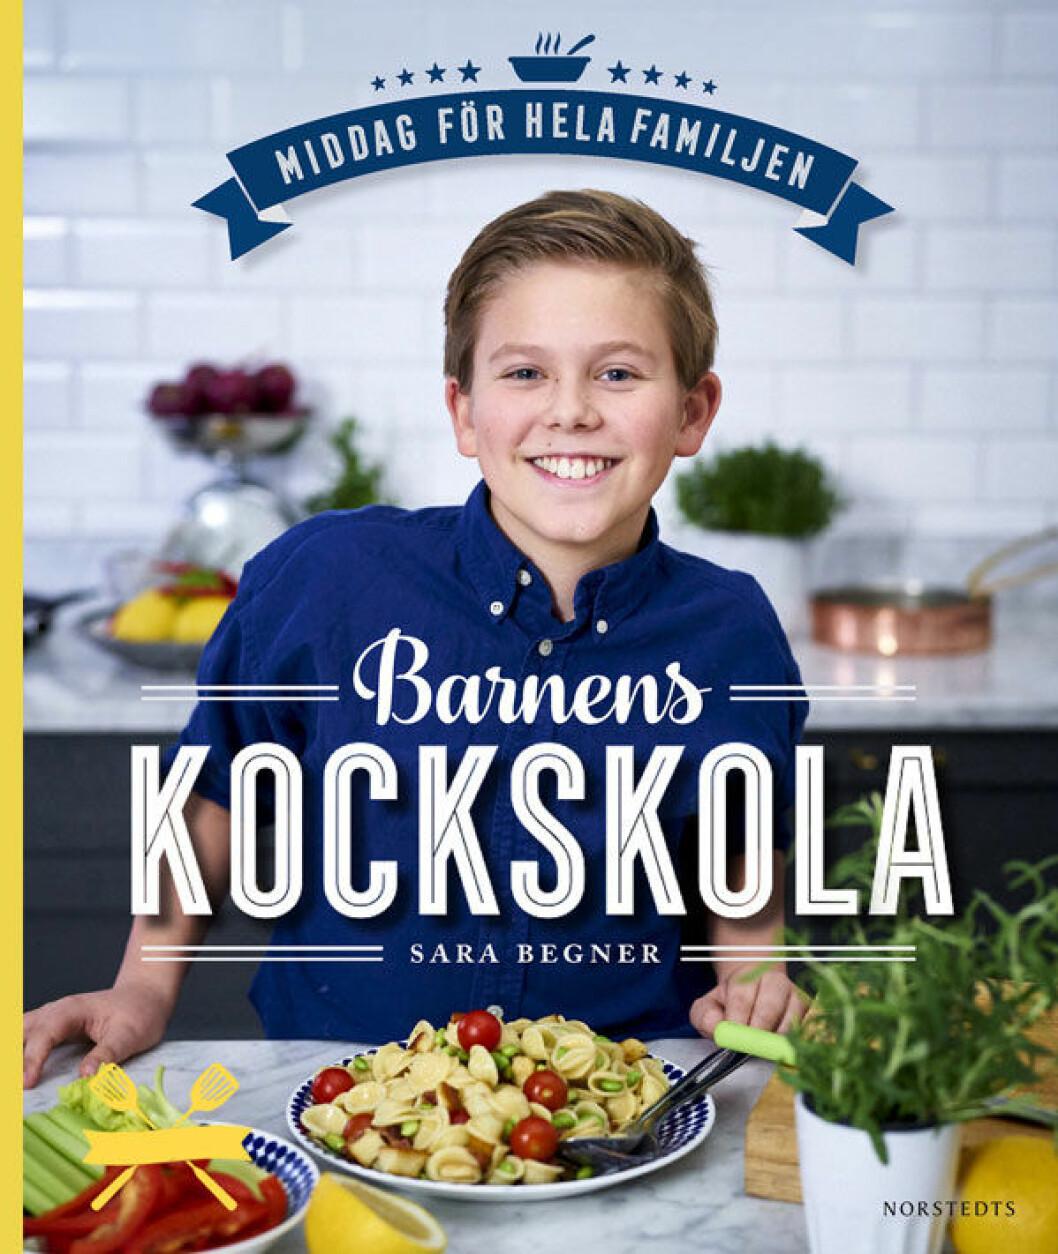 Kokboken Barnens kockskola av Sara Begner.